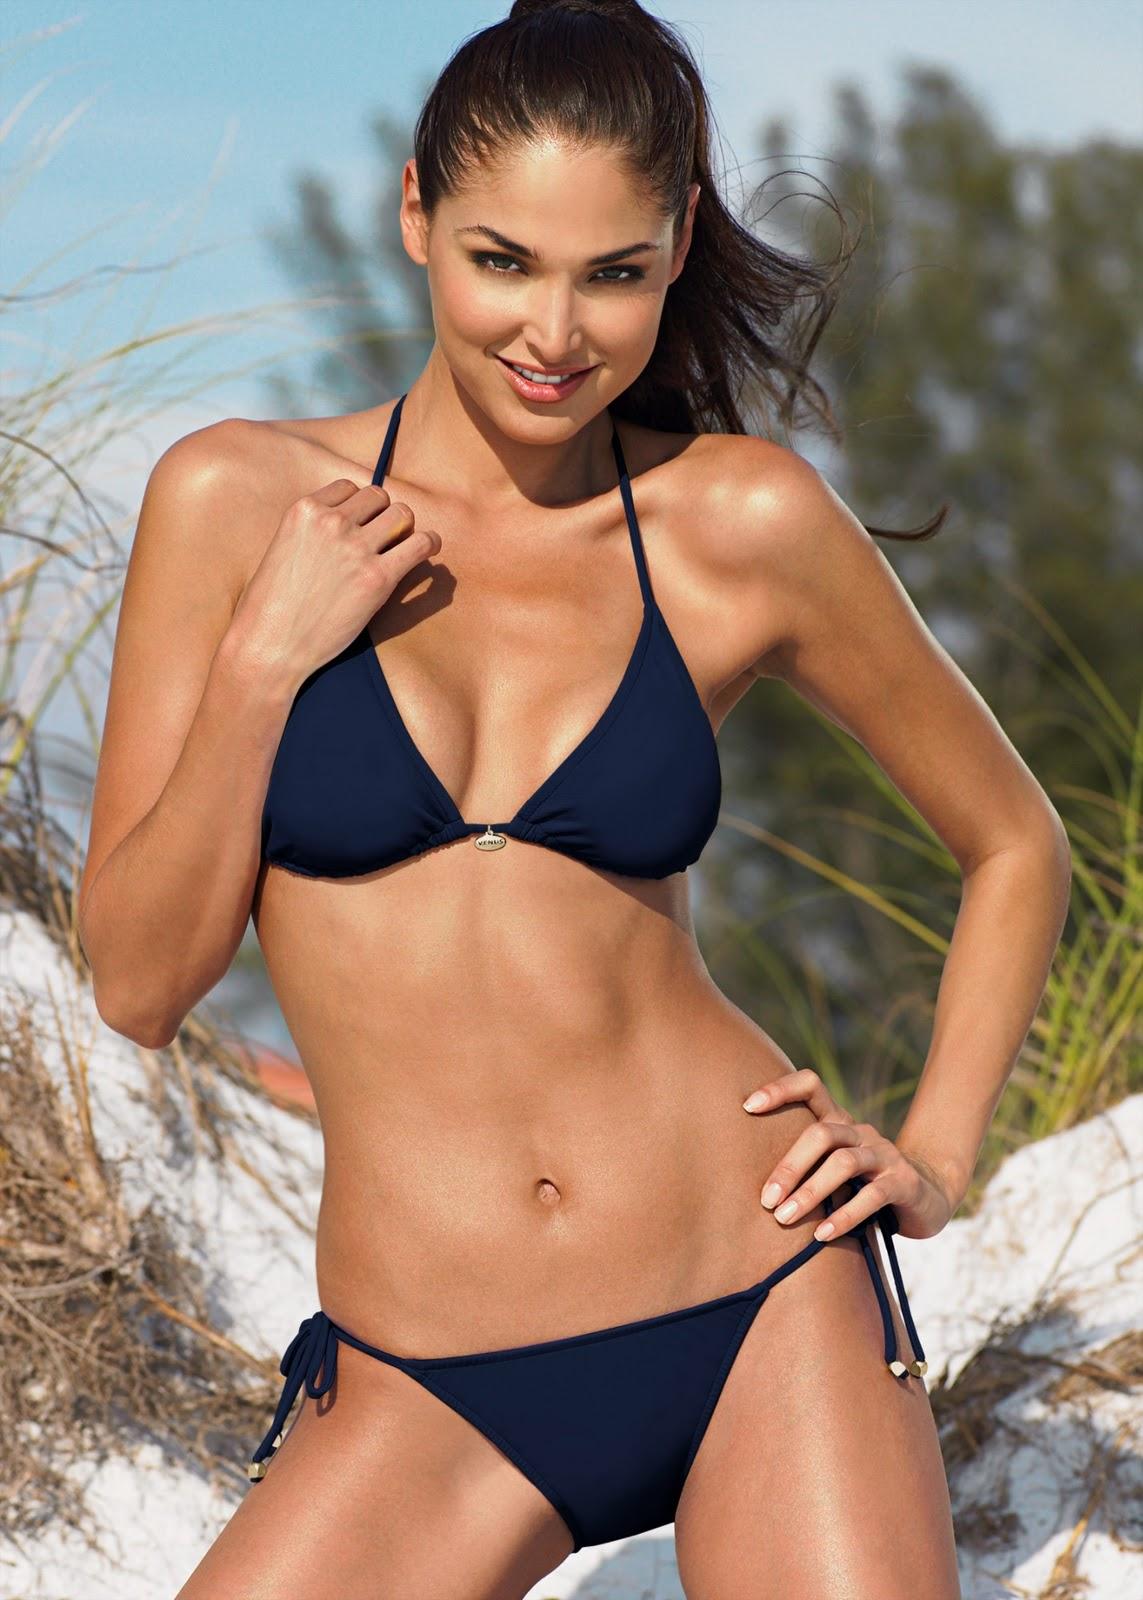 Porque El Amor Manda Blanca Soto Posa En Bikini Para